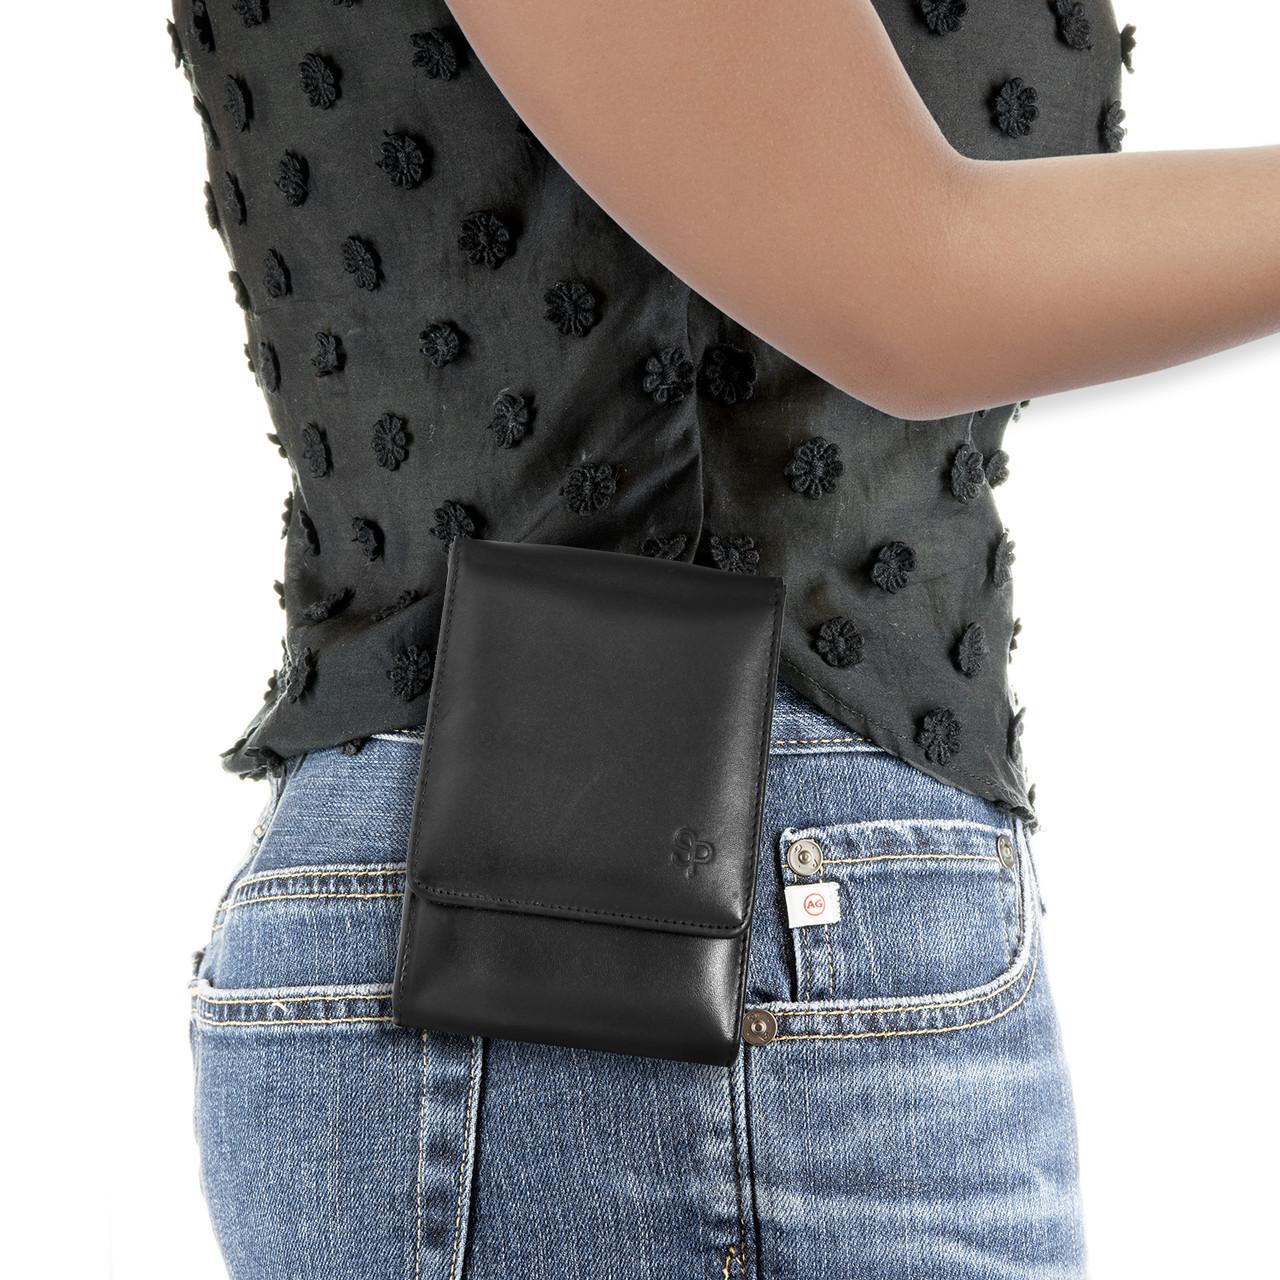 Glock 19X Black Leather Holster